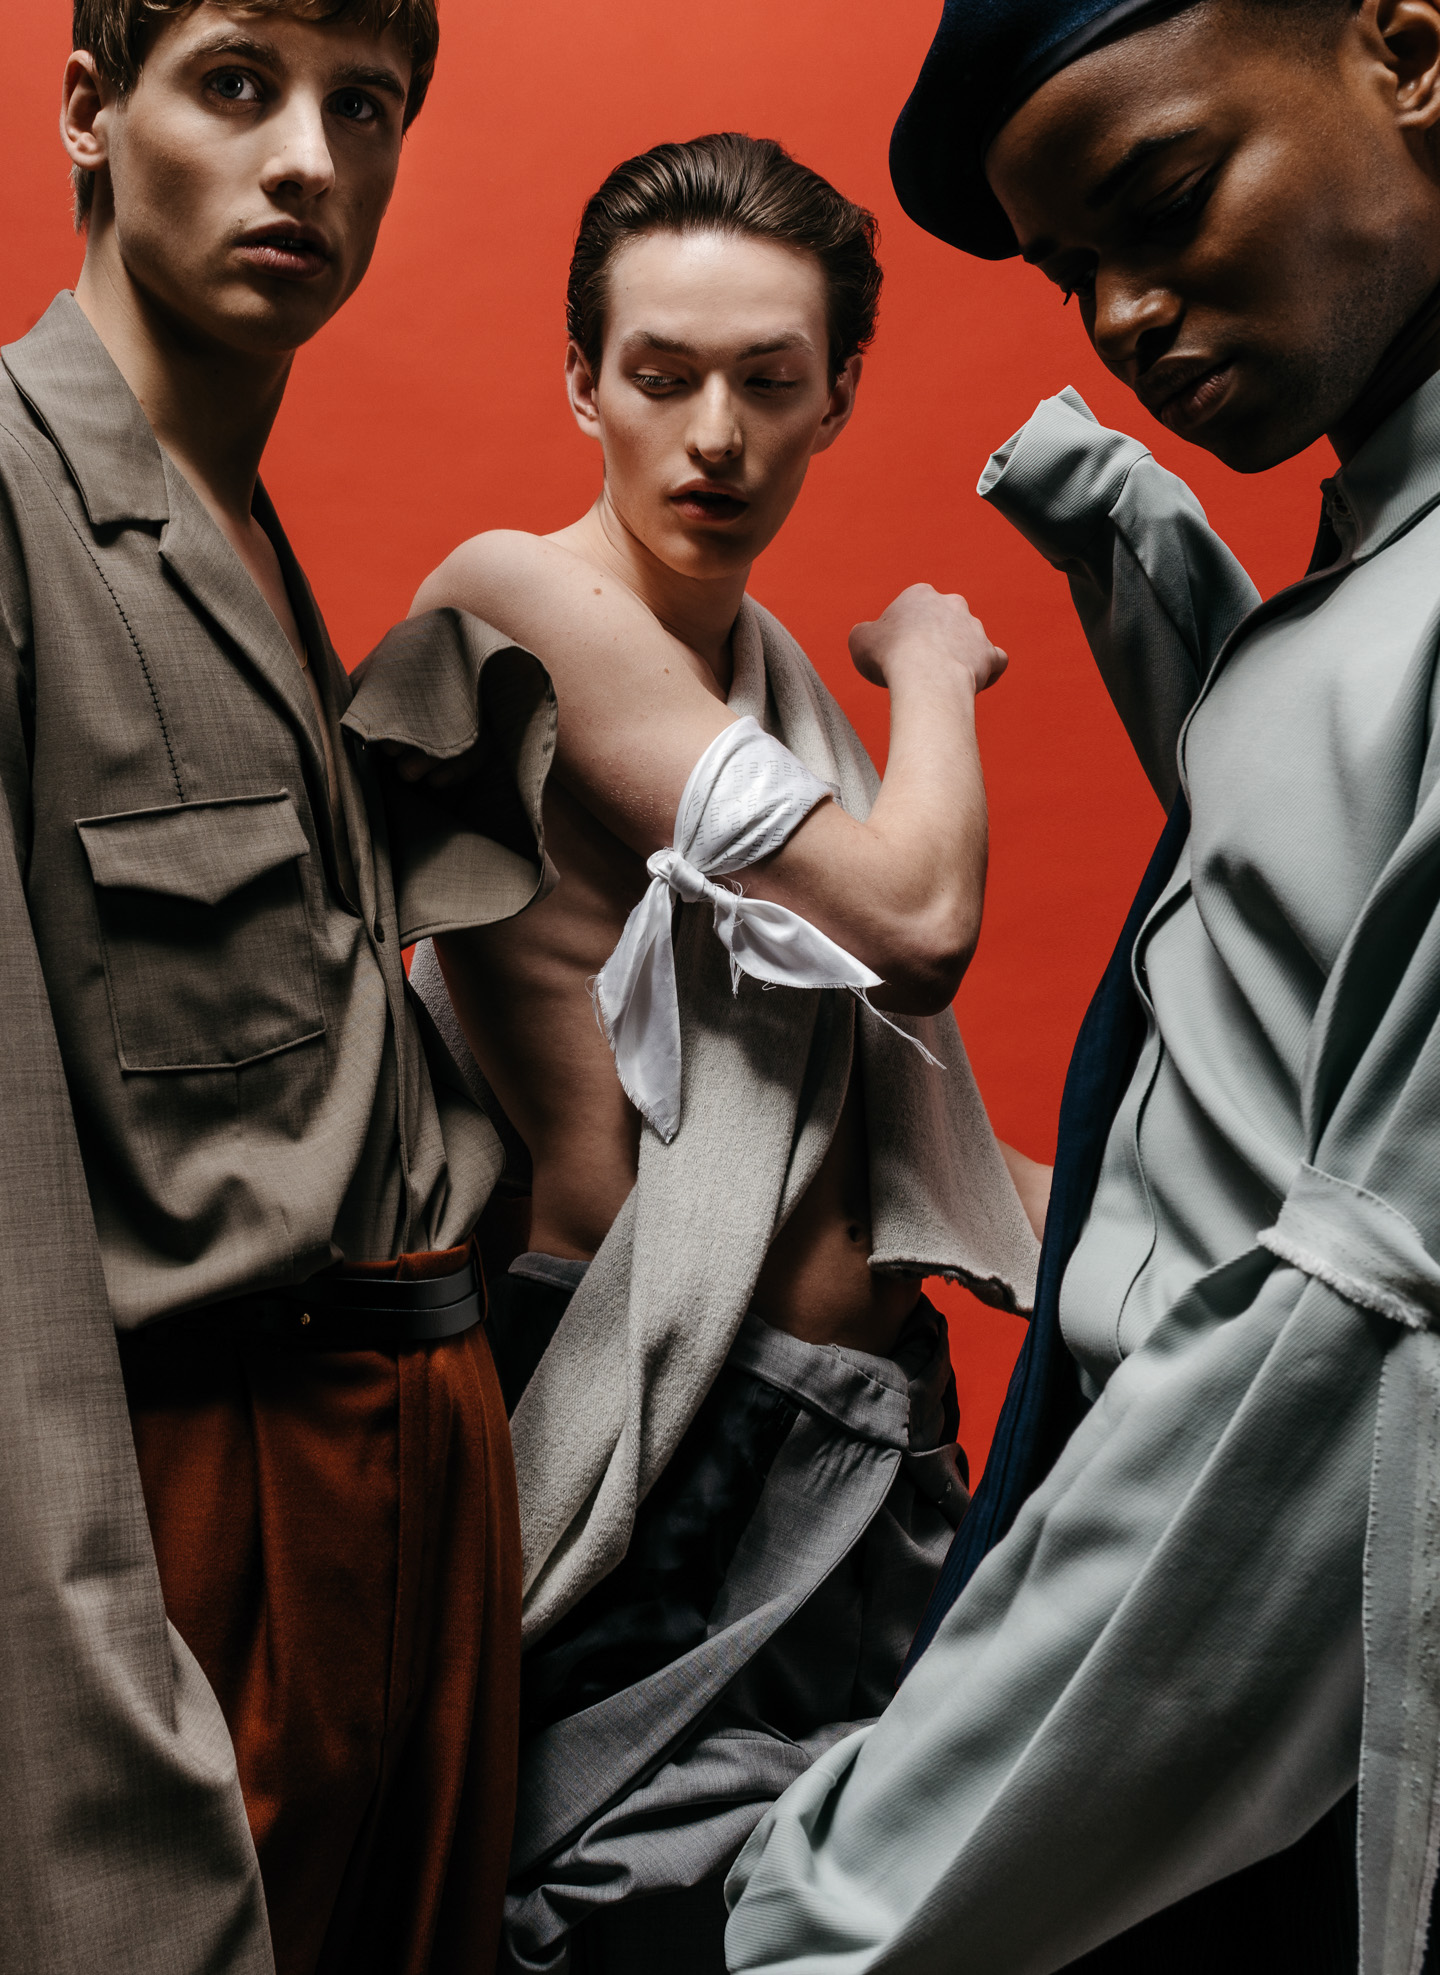 Frank-Lin-Collection-Muse-Daniel Imasua-modelwerk-Influencer-Erik-kett-pma-AMD-Model-Shooting-Julia-Sang-Nguyen-Felipe-Palma-boyspalm-nina-wagner-Erik-kett-pma-Daniel Imasua-modelwerk-Frank-peeters-Imm